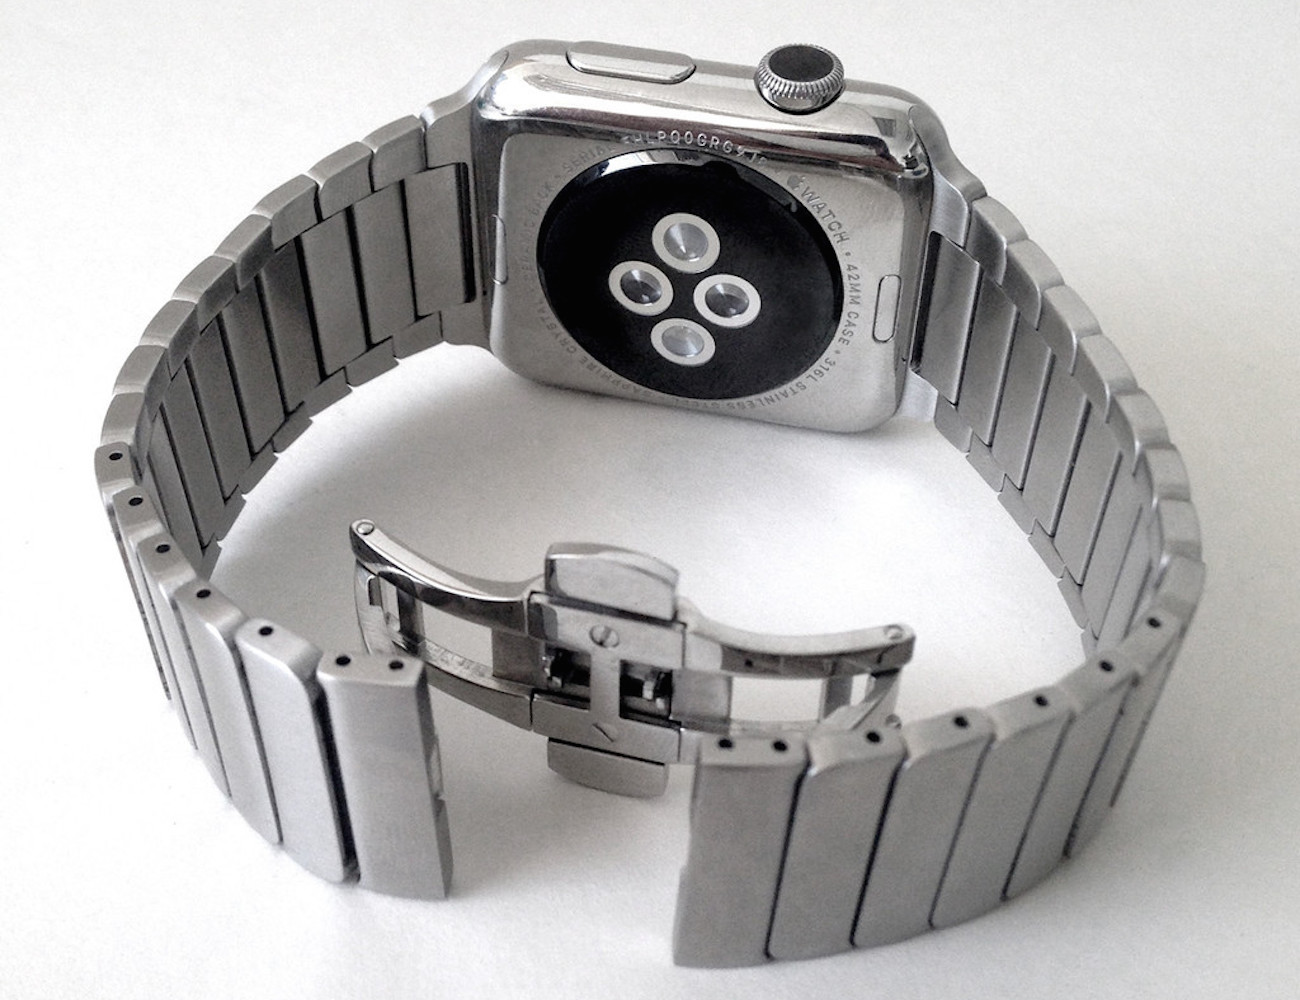 Link Bracelet Stainless Steel Strap Band